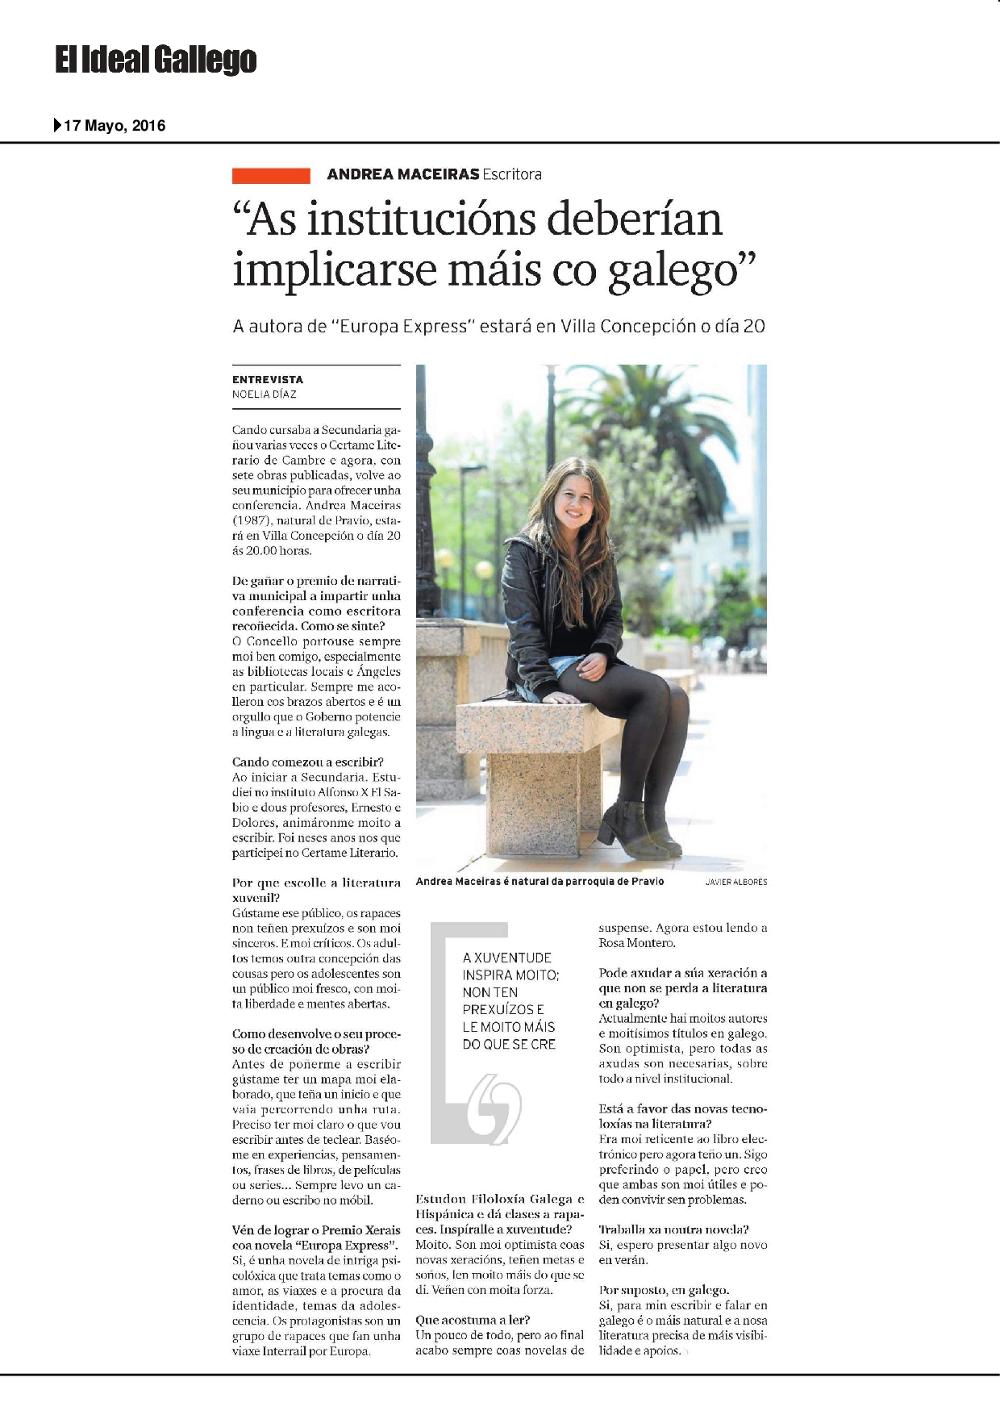 Entrevista a Andrea Maceiras El Ideal Gallego 17-05-2016